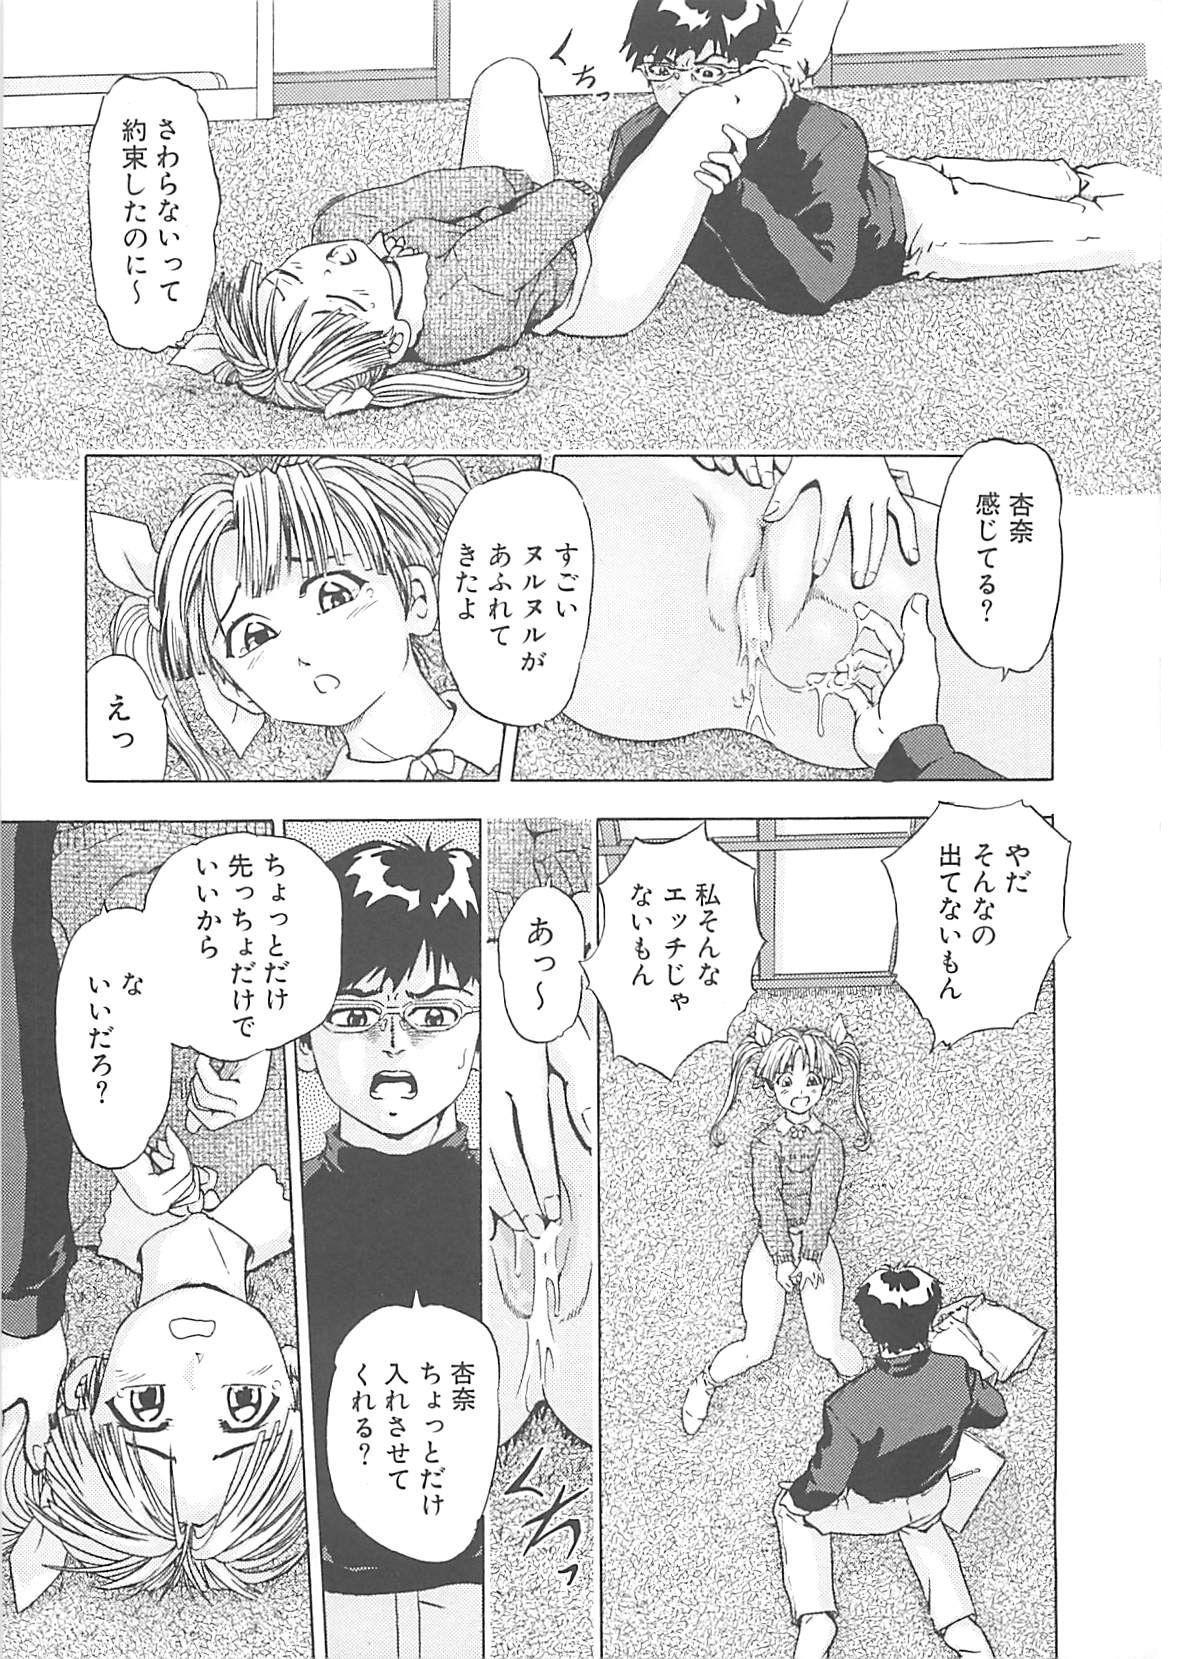 Kanin Kyoushitsu - Adultery Classroom 13